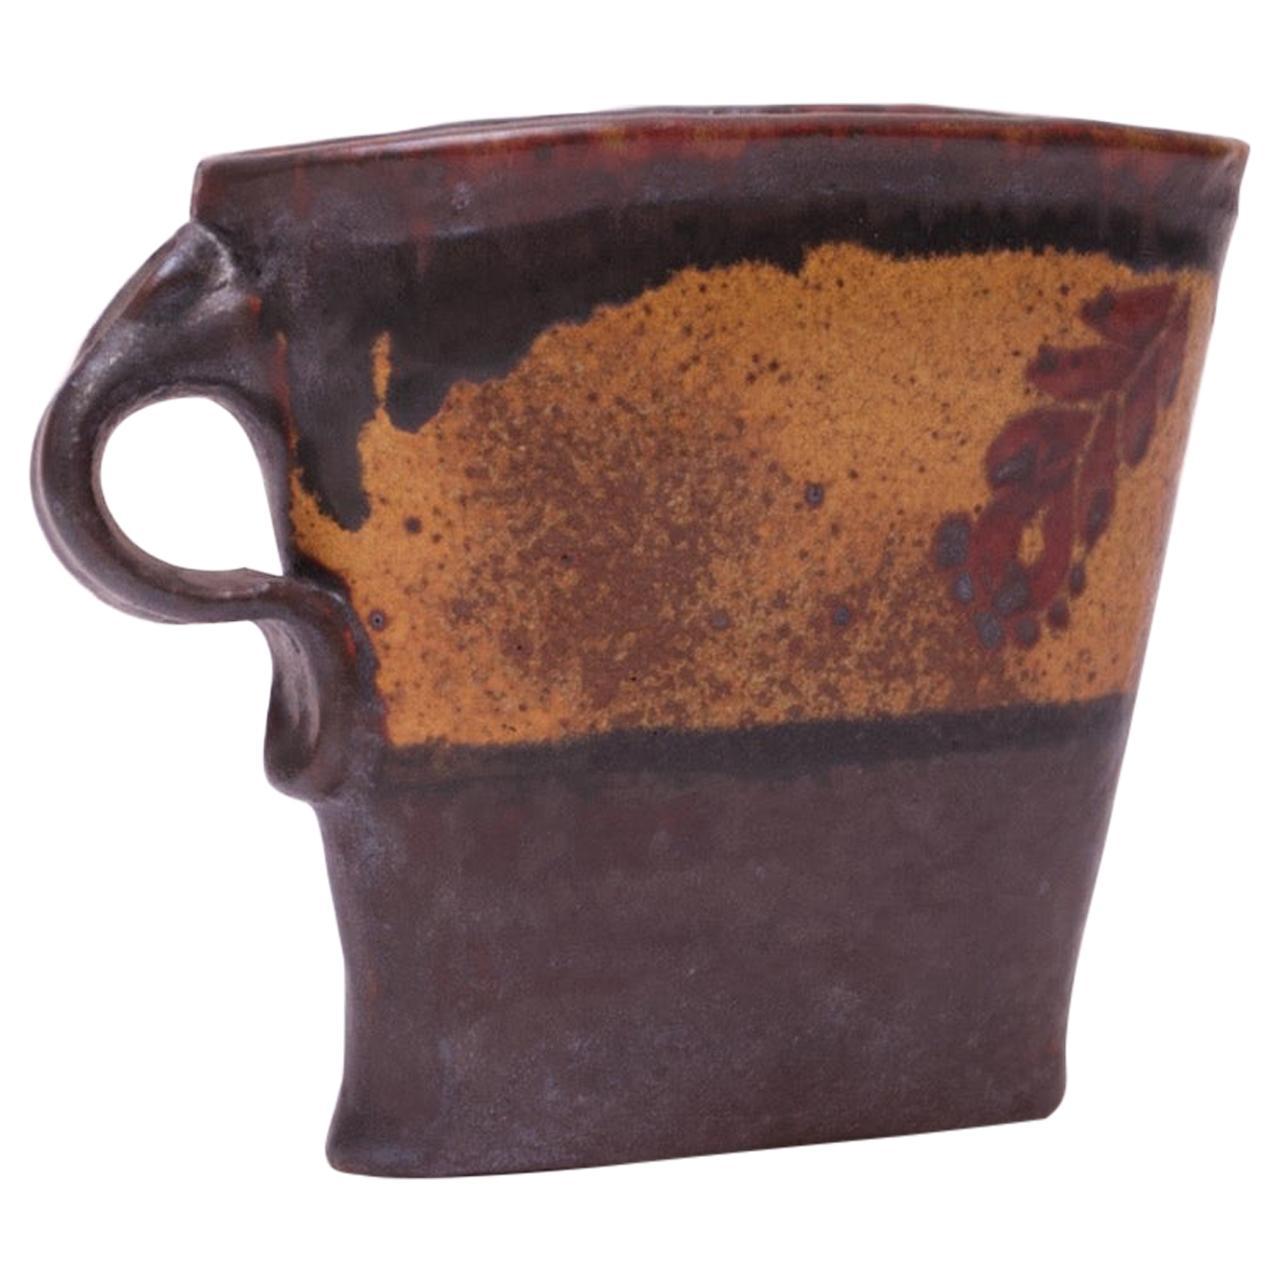 "Studio Stoneware Pitcher / Vase Signed ""Pollack 70"""